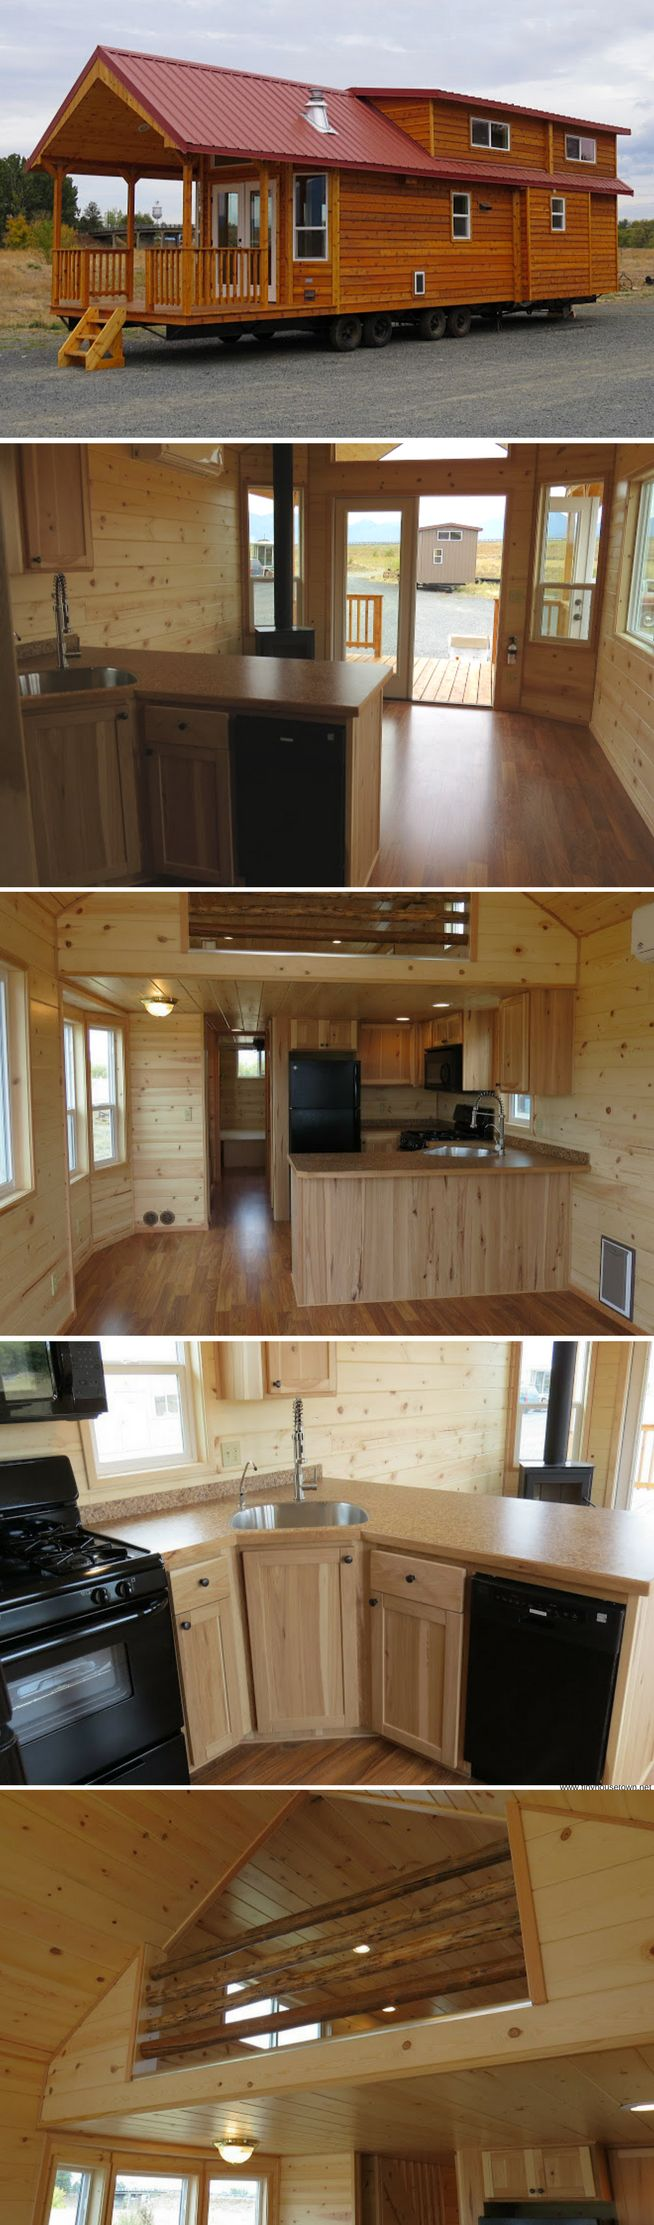 Classic Double Loft: a two bedroom park model cabin